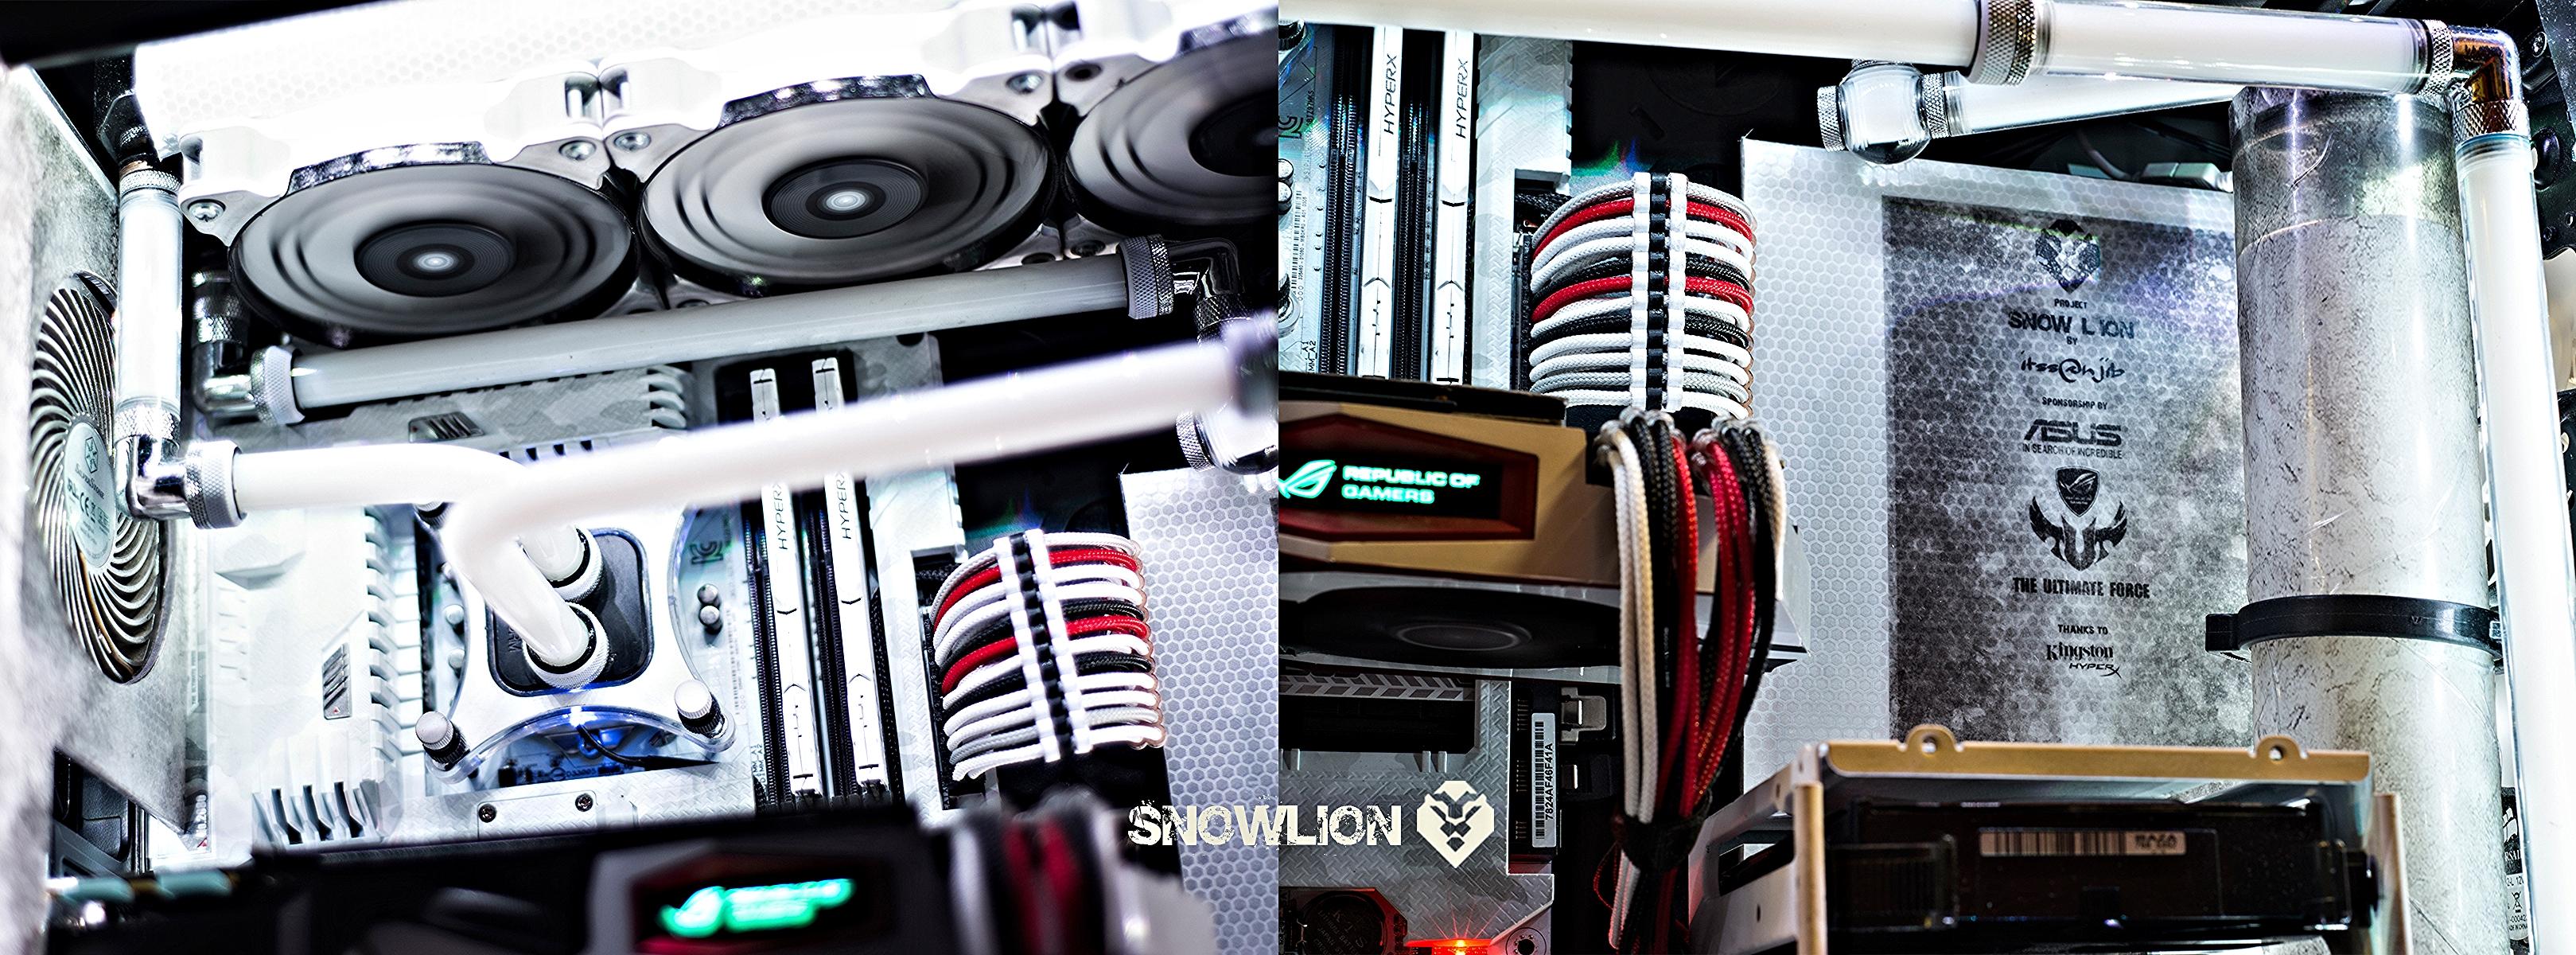 snowlion84